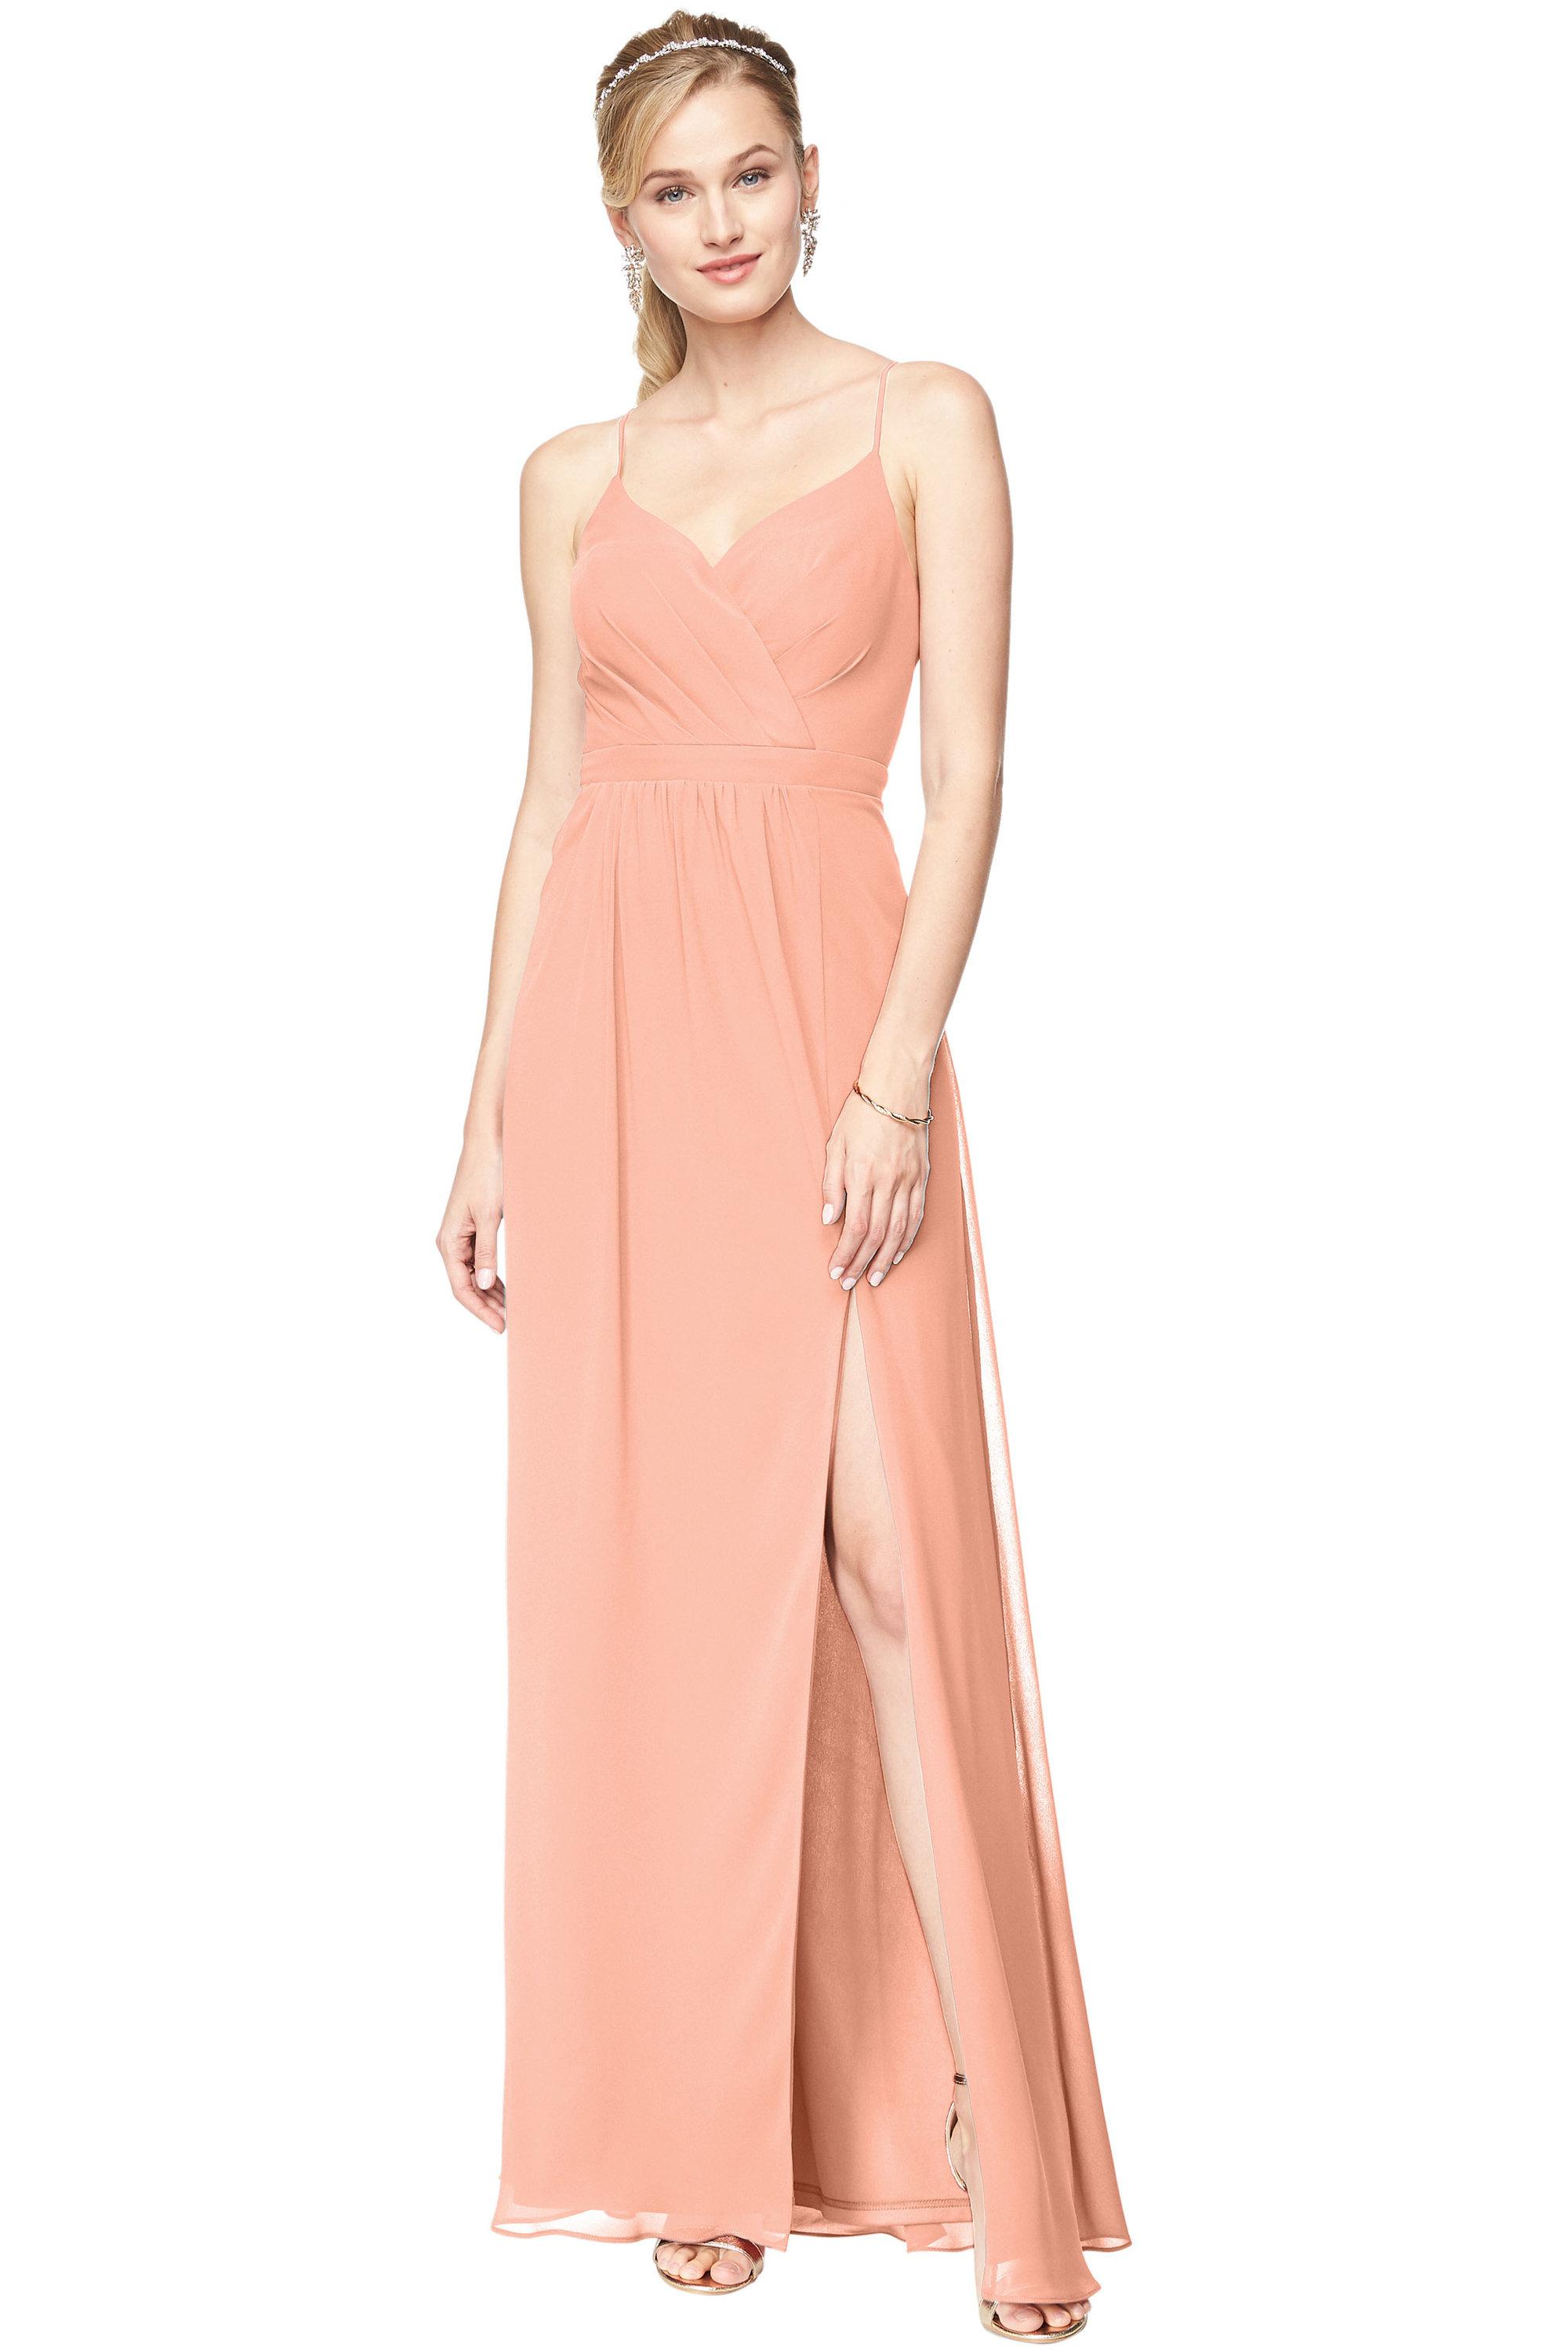 Bill Levkoff PEACH Chiffon Surplice A-Line gown, $178.00 Front